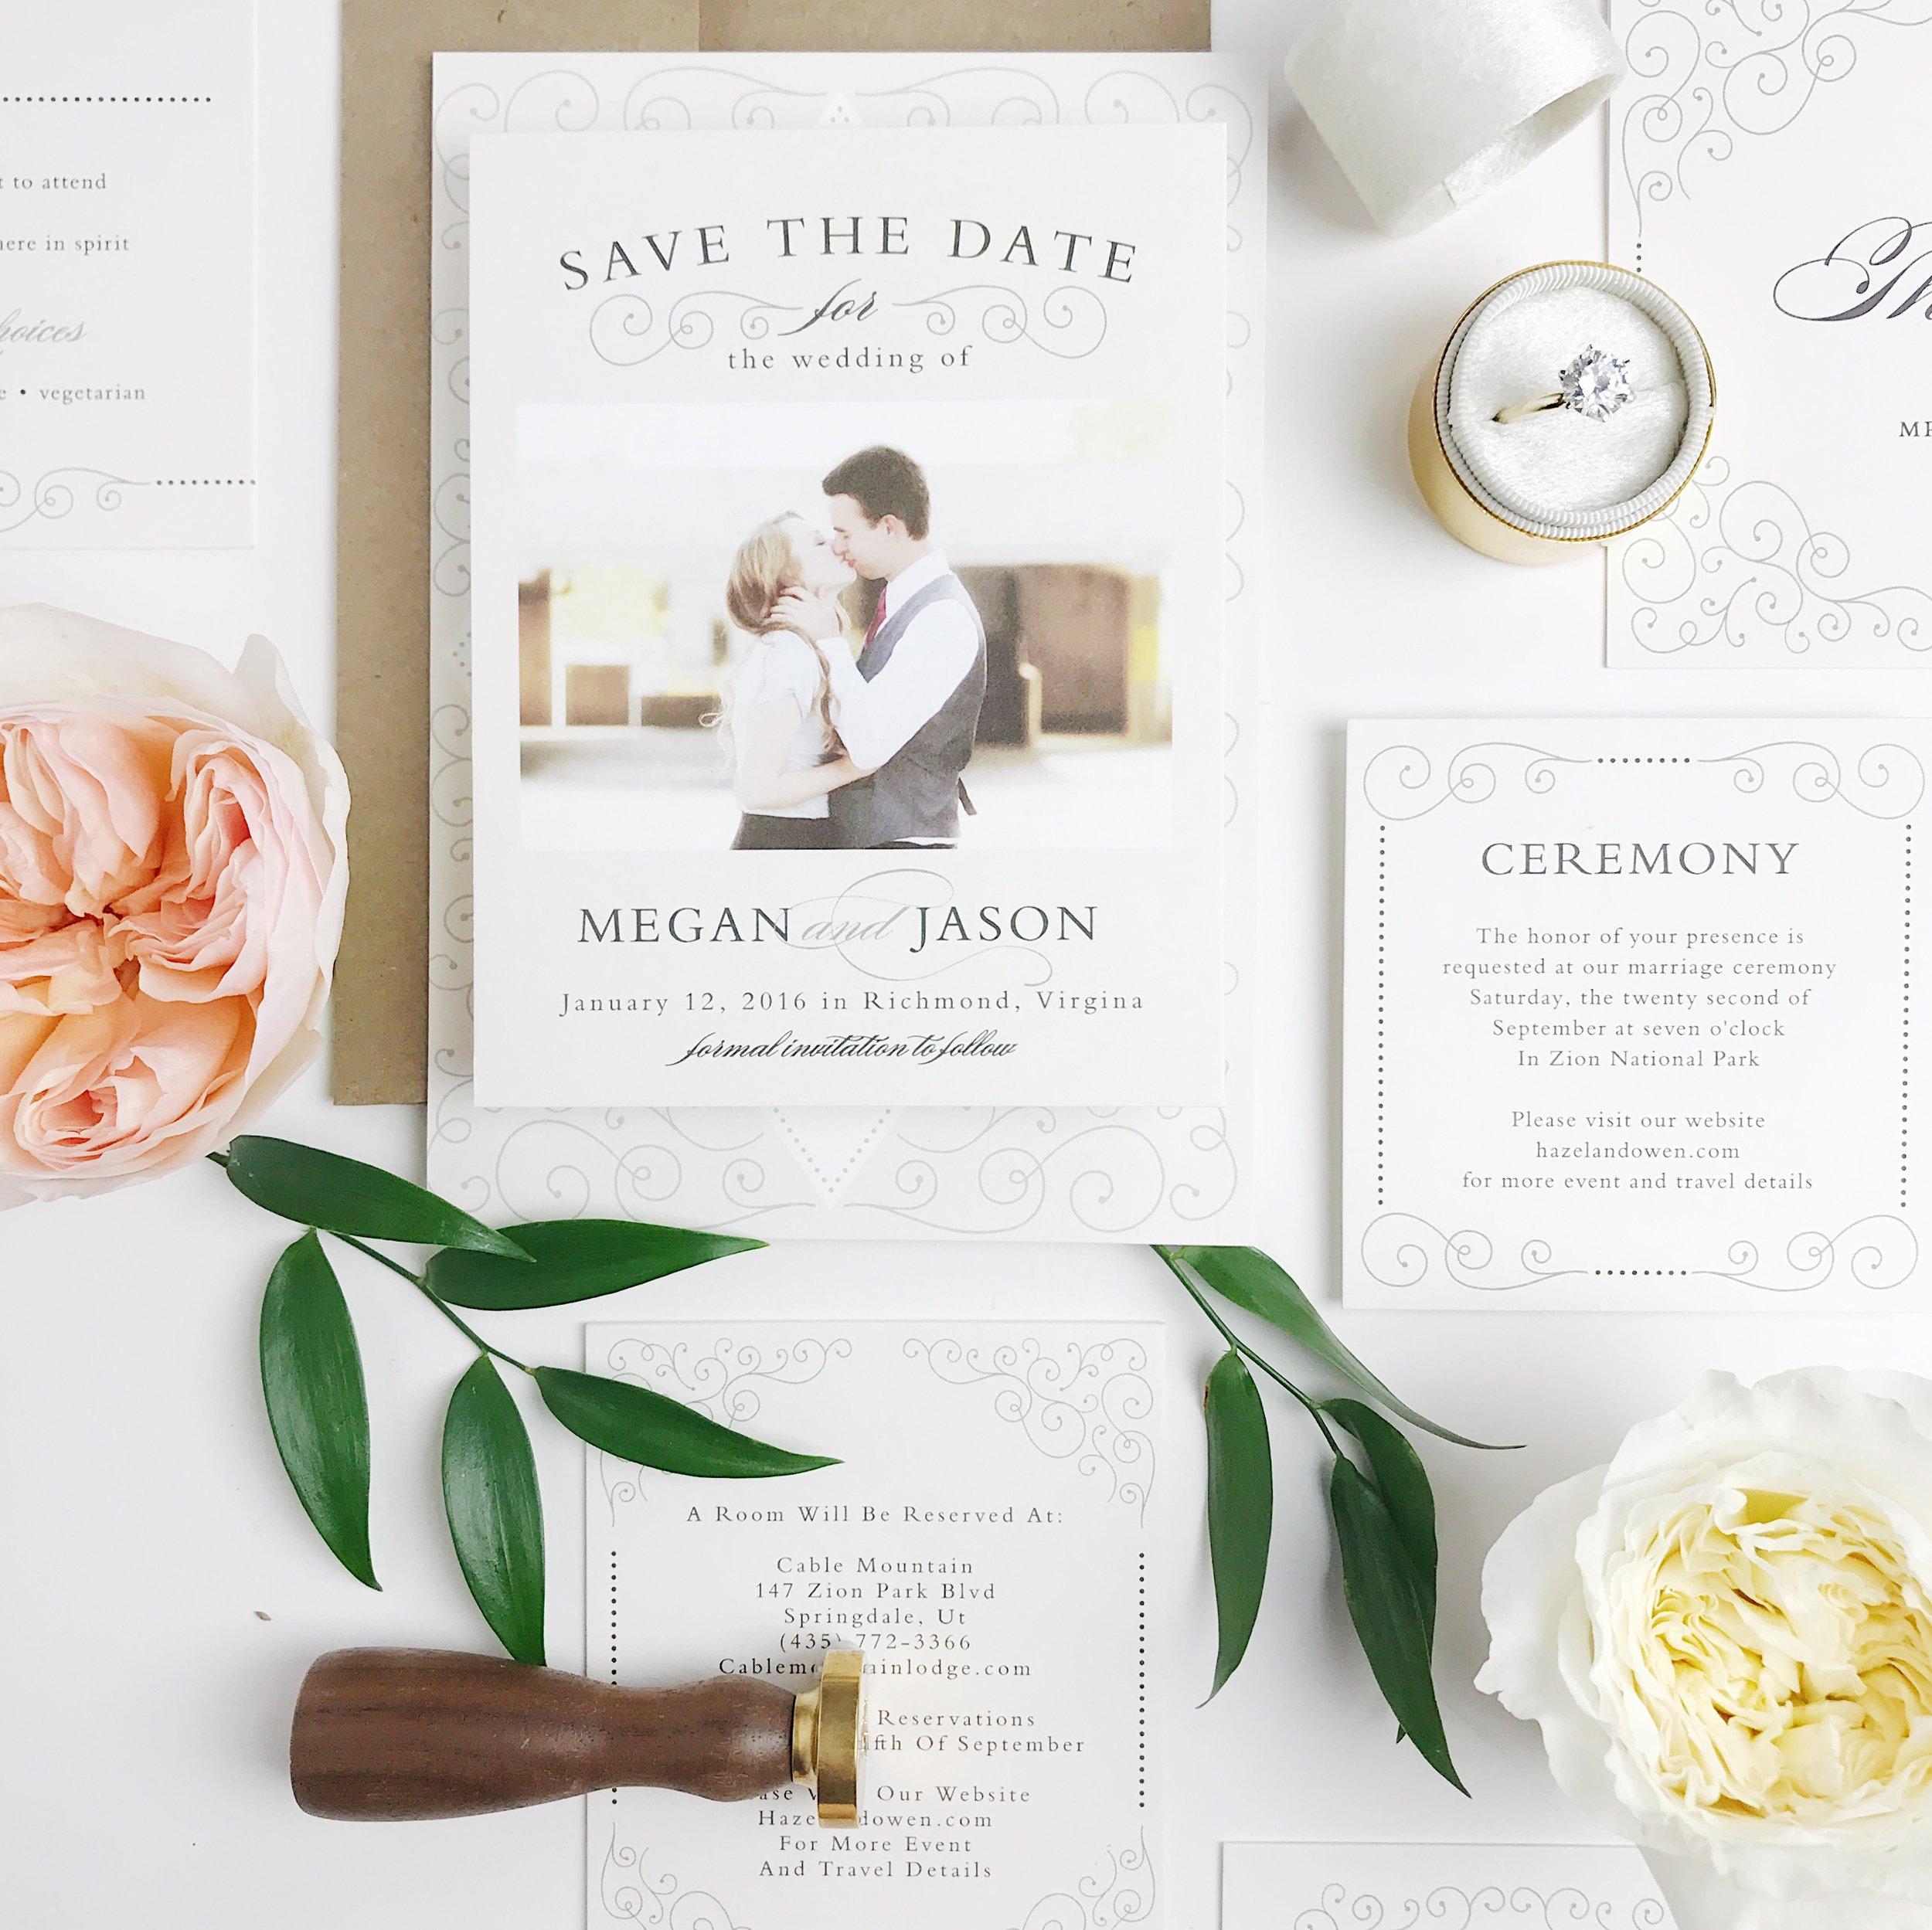 Basic_Invite_Wedding_Suites_37.jpg